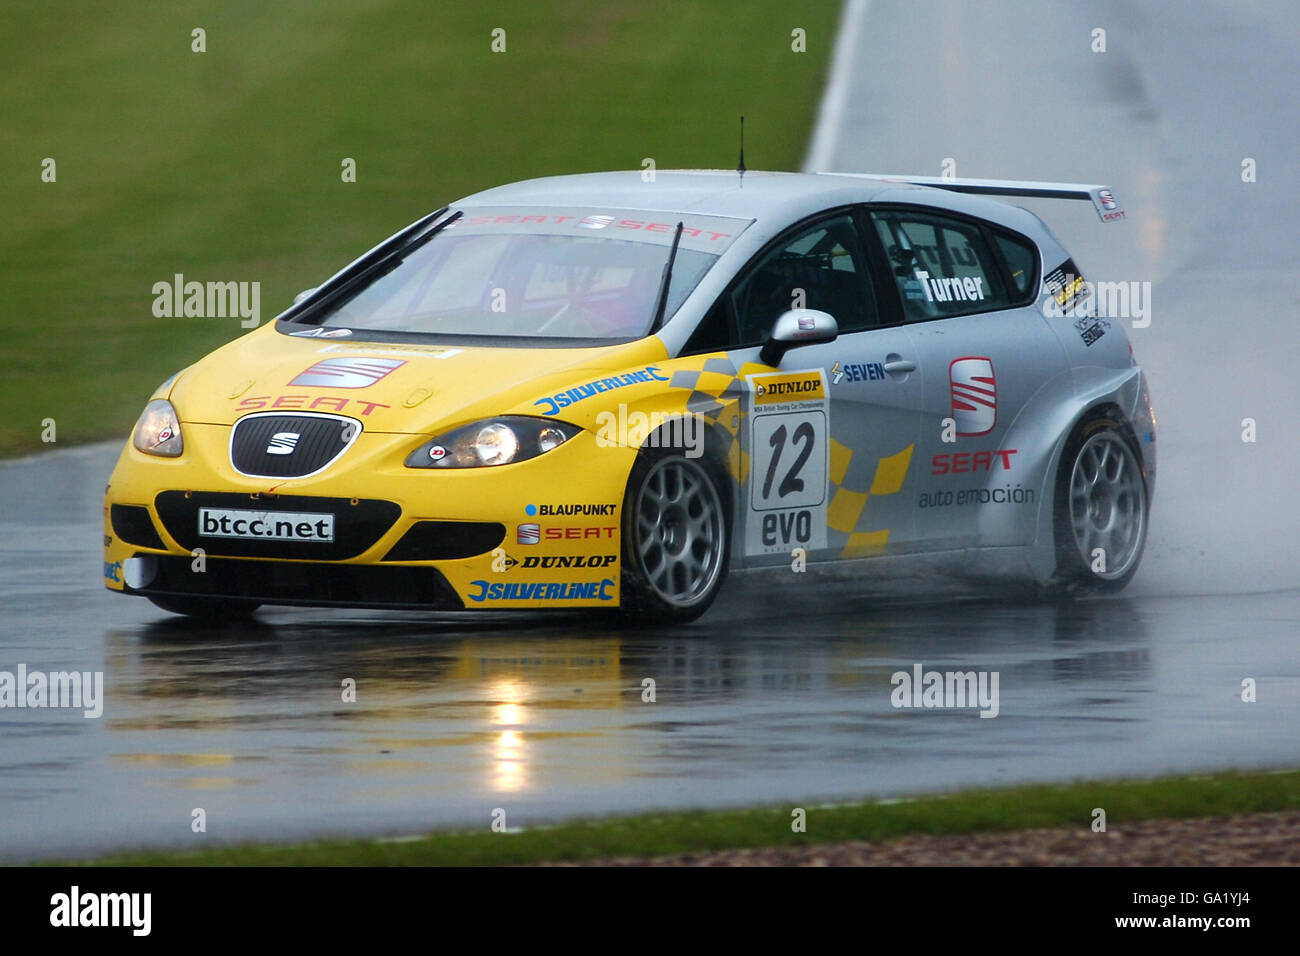 Motor Sport - Dunlop British Touring Car Championship - Donington Park - Stock Image